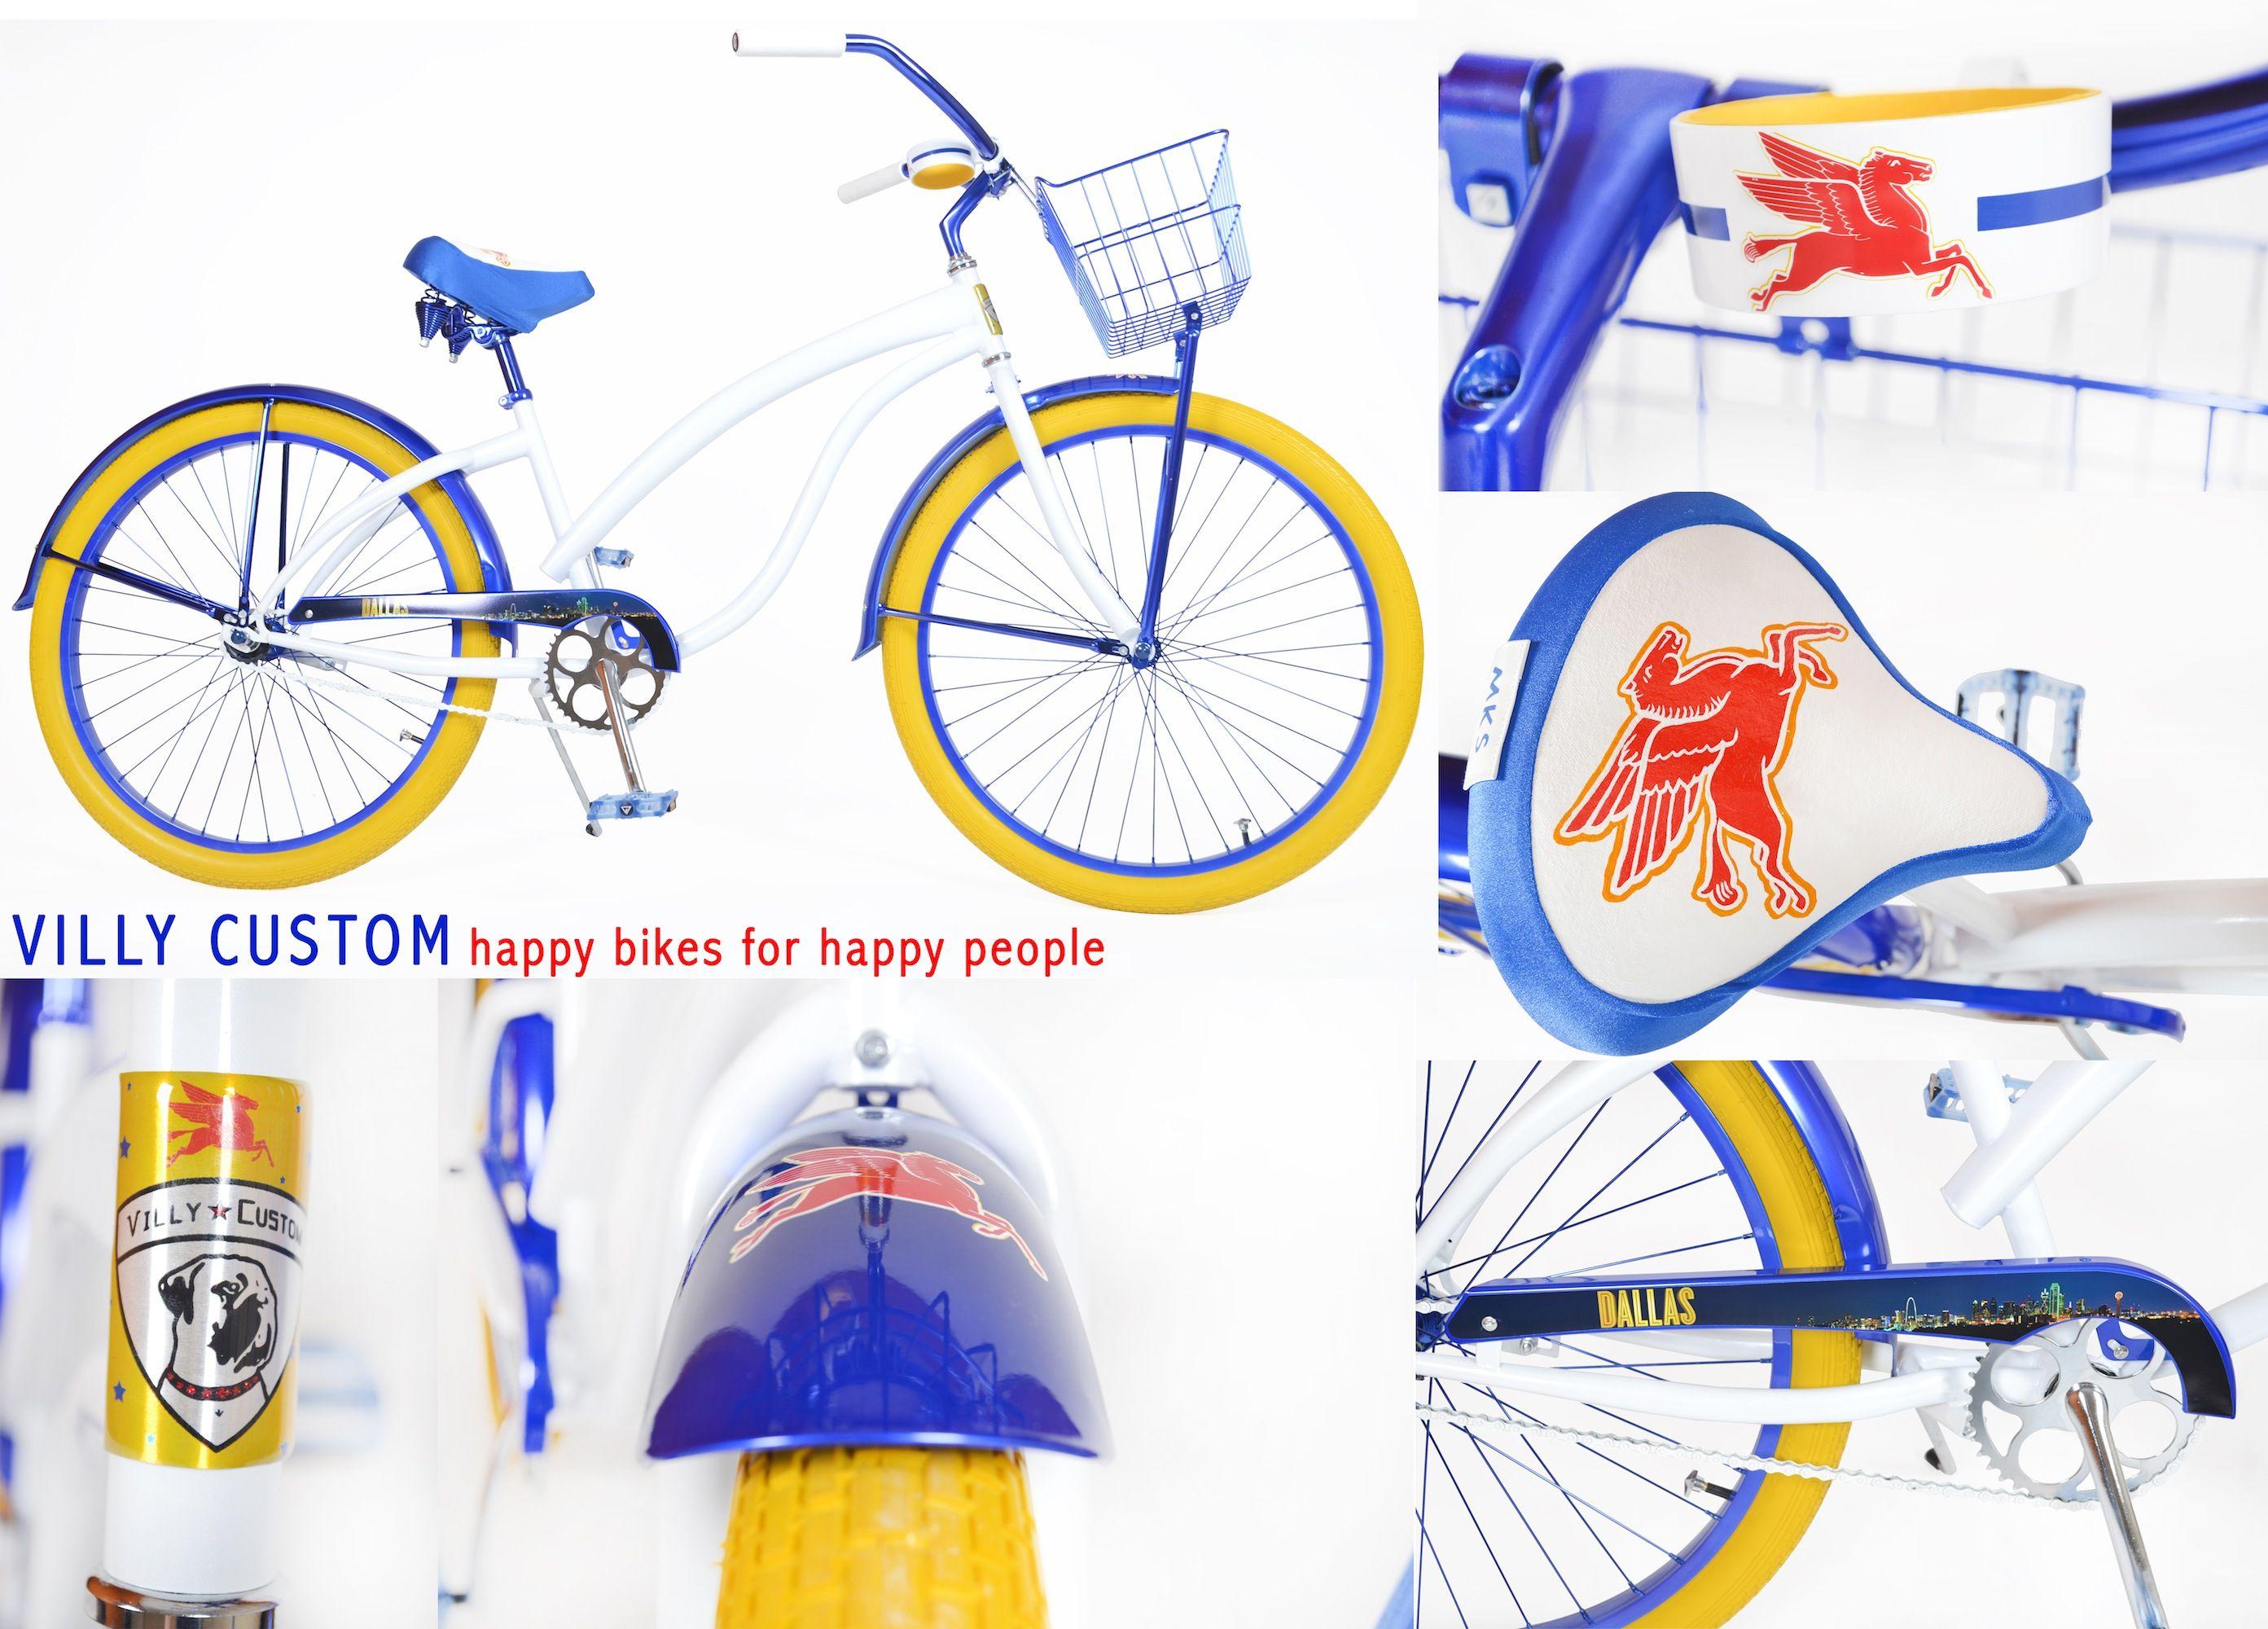 Custom Dallas, TX beach cruiser bicycle by Villy Customs!  www.villycustoms.com